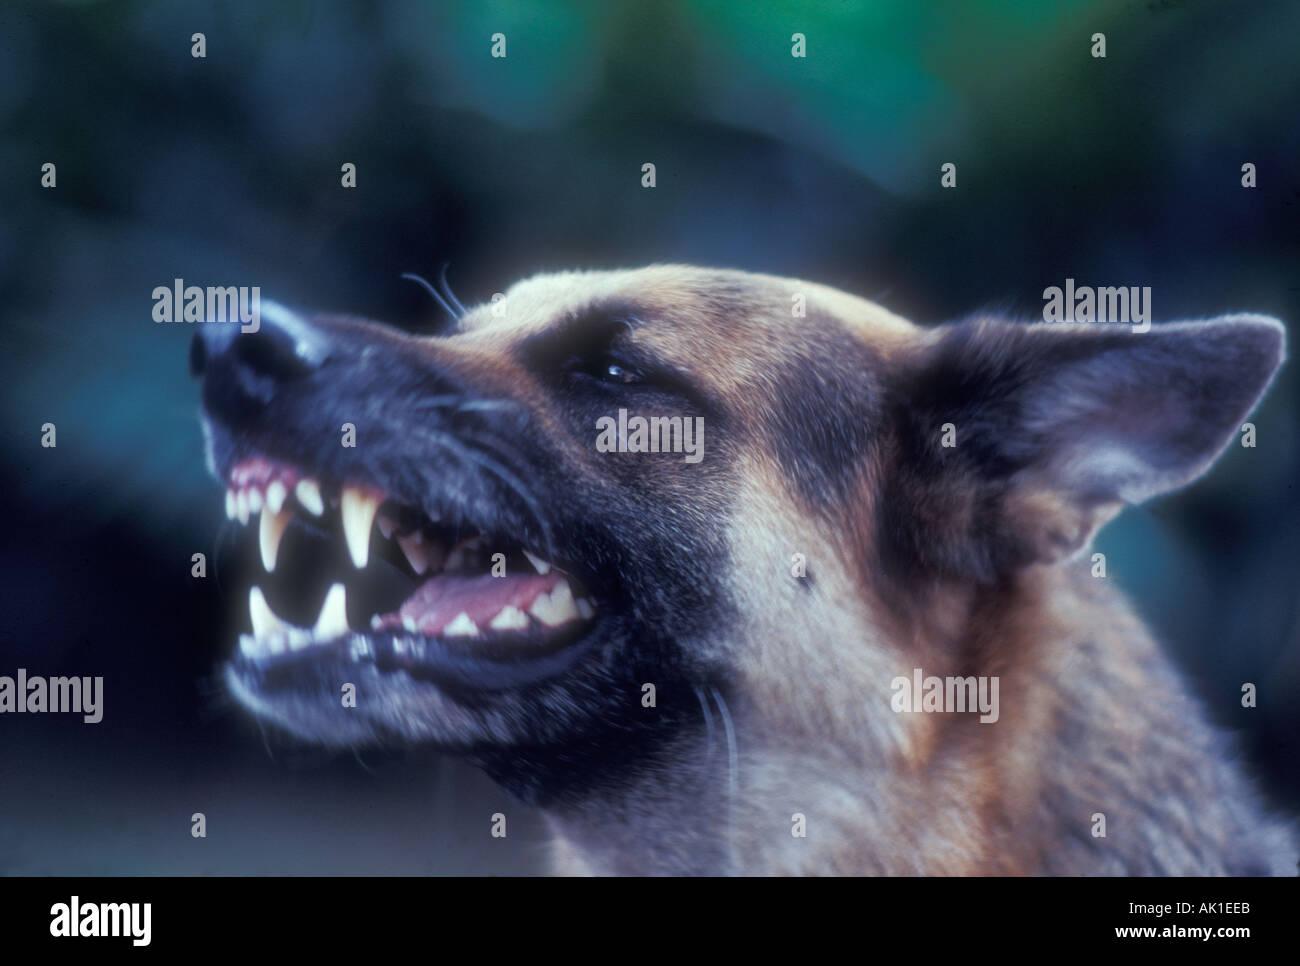 german shepherd growling - photo #14